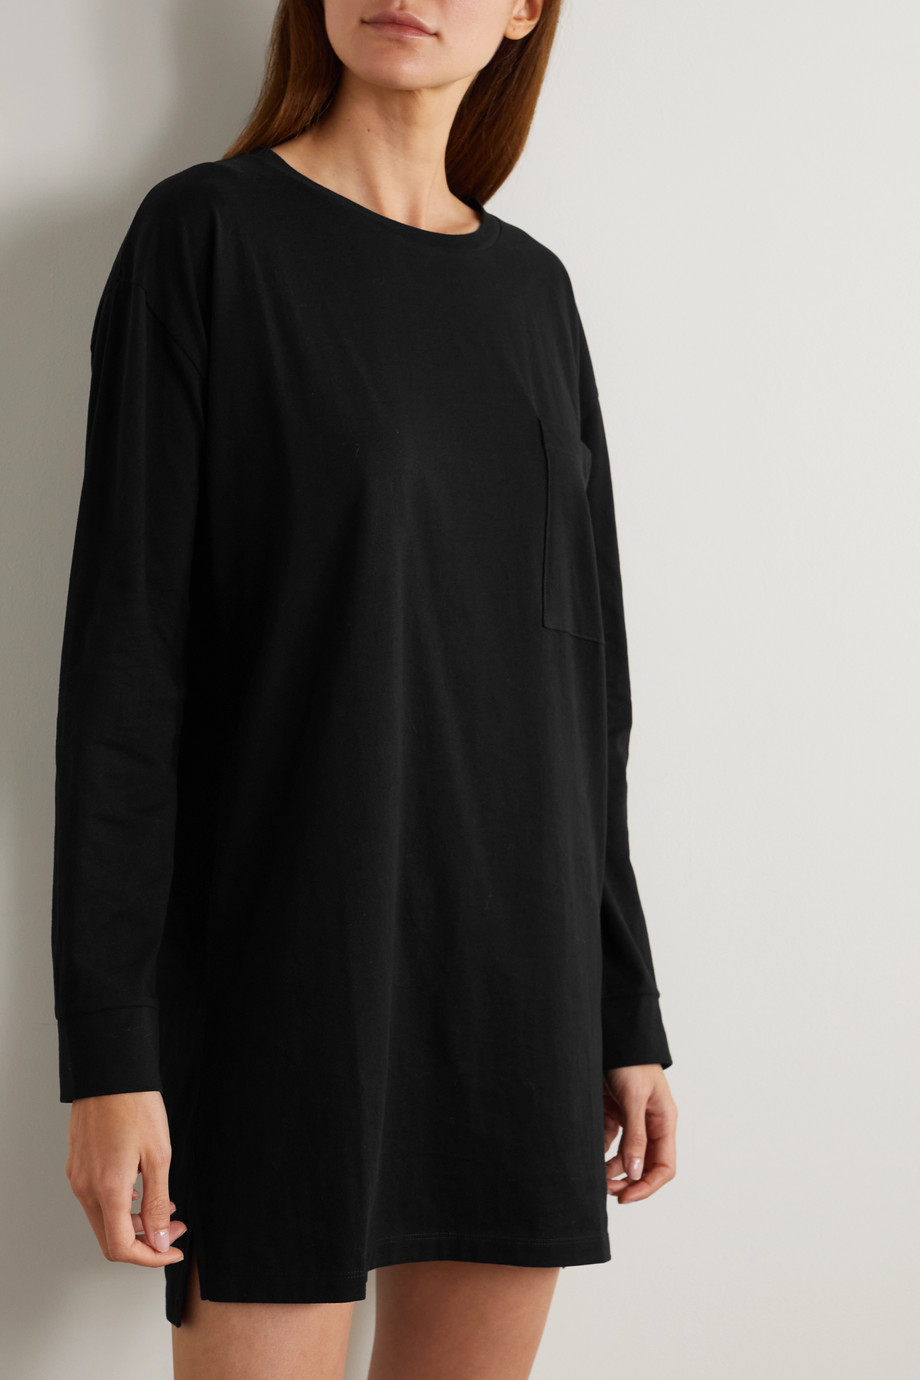 Ninety Percent + NET SUSTAIN embroidered organic cotton-jersey nightdress